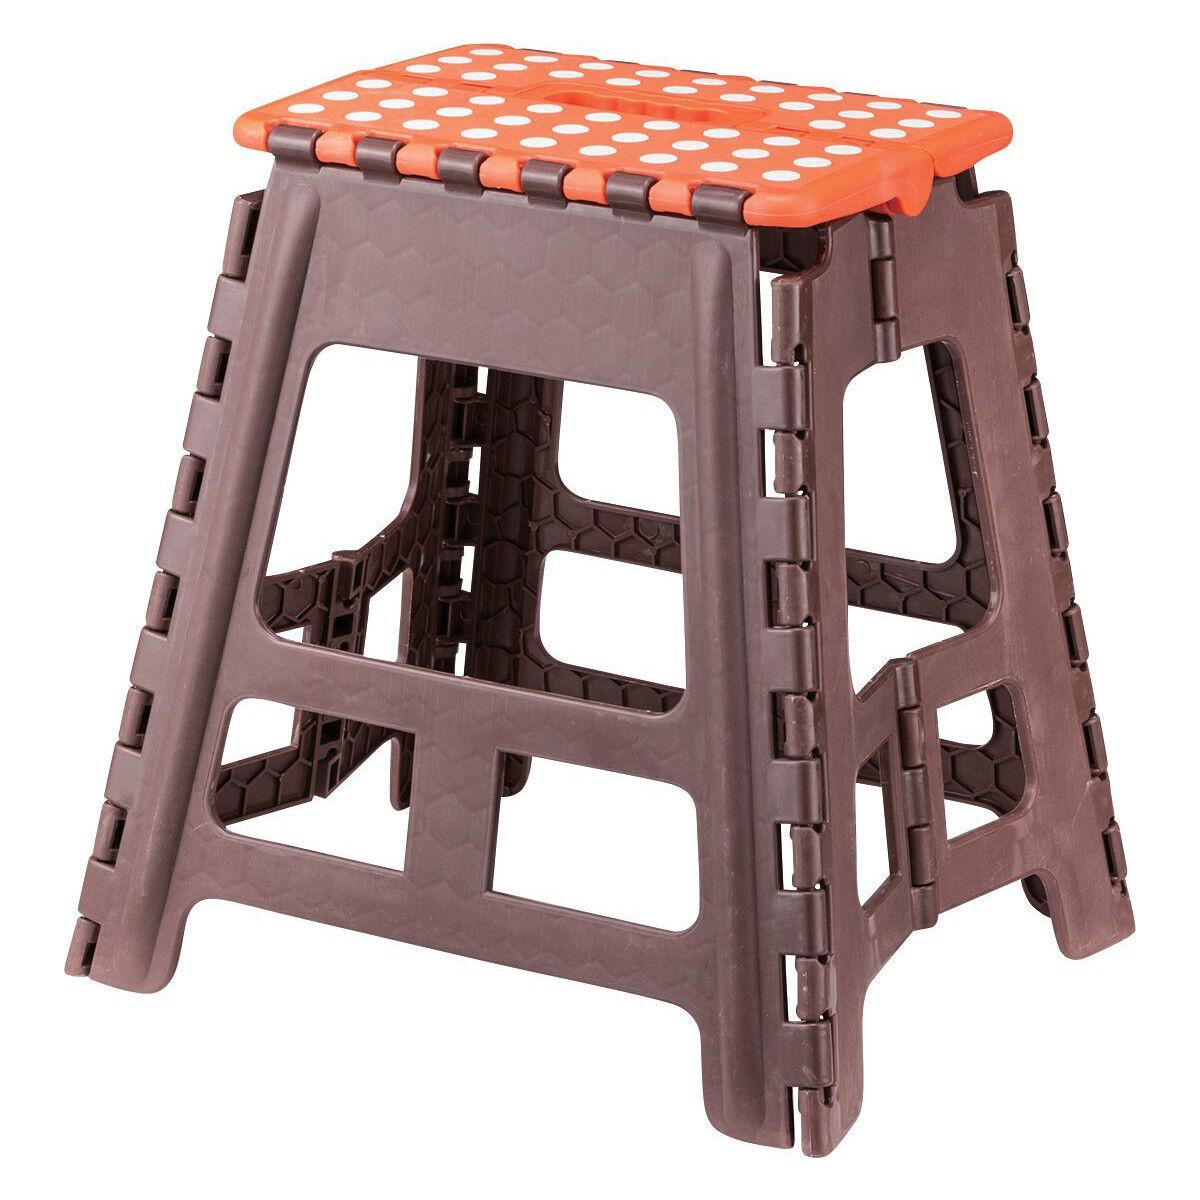 folding stool portable chair step stool home